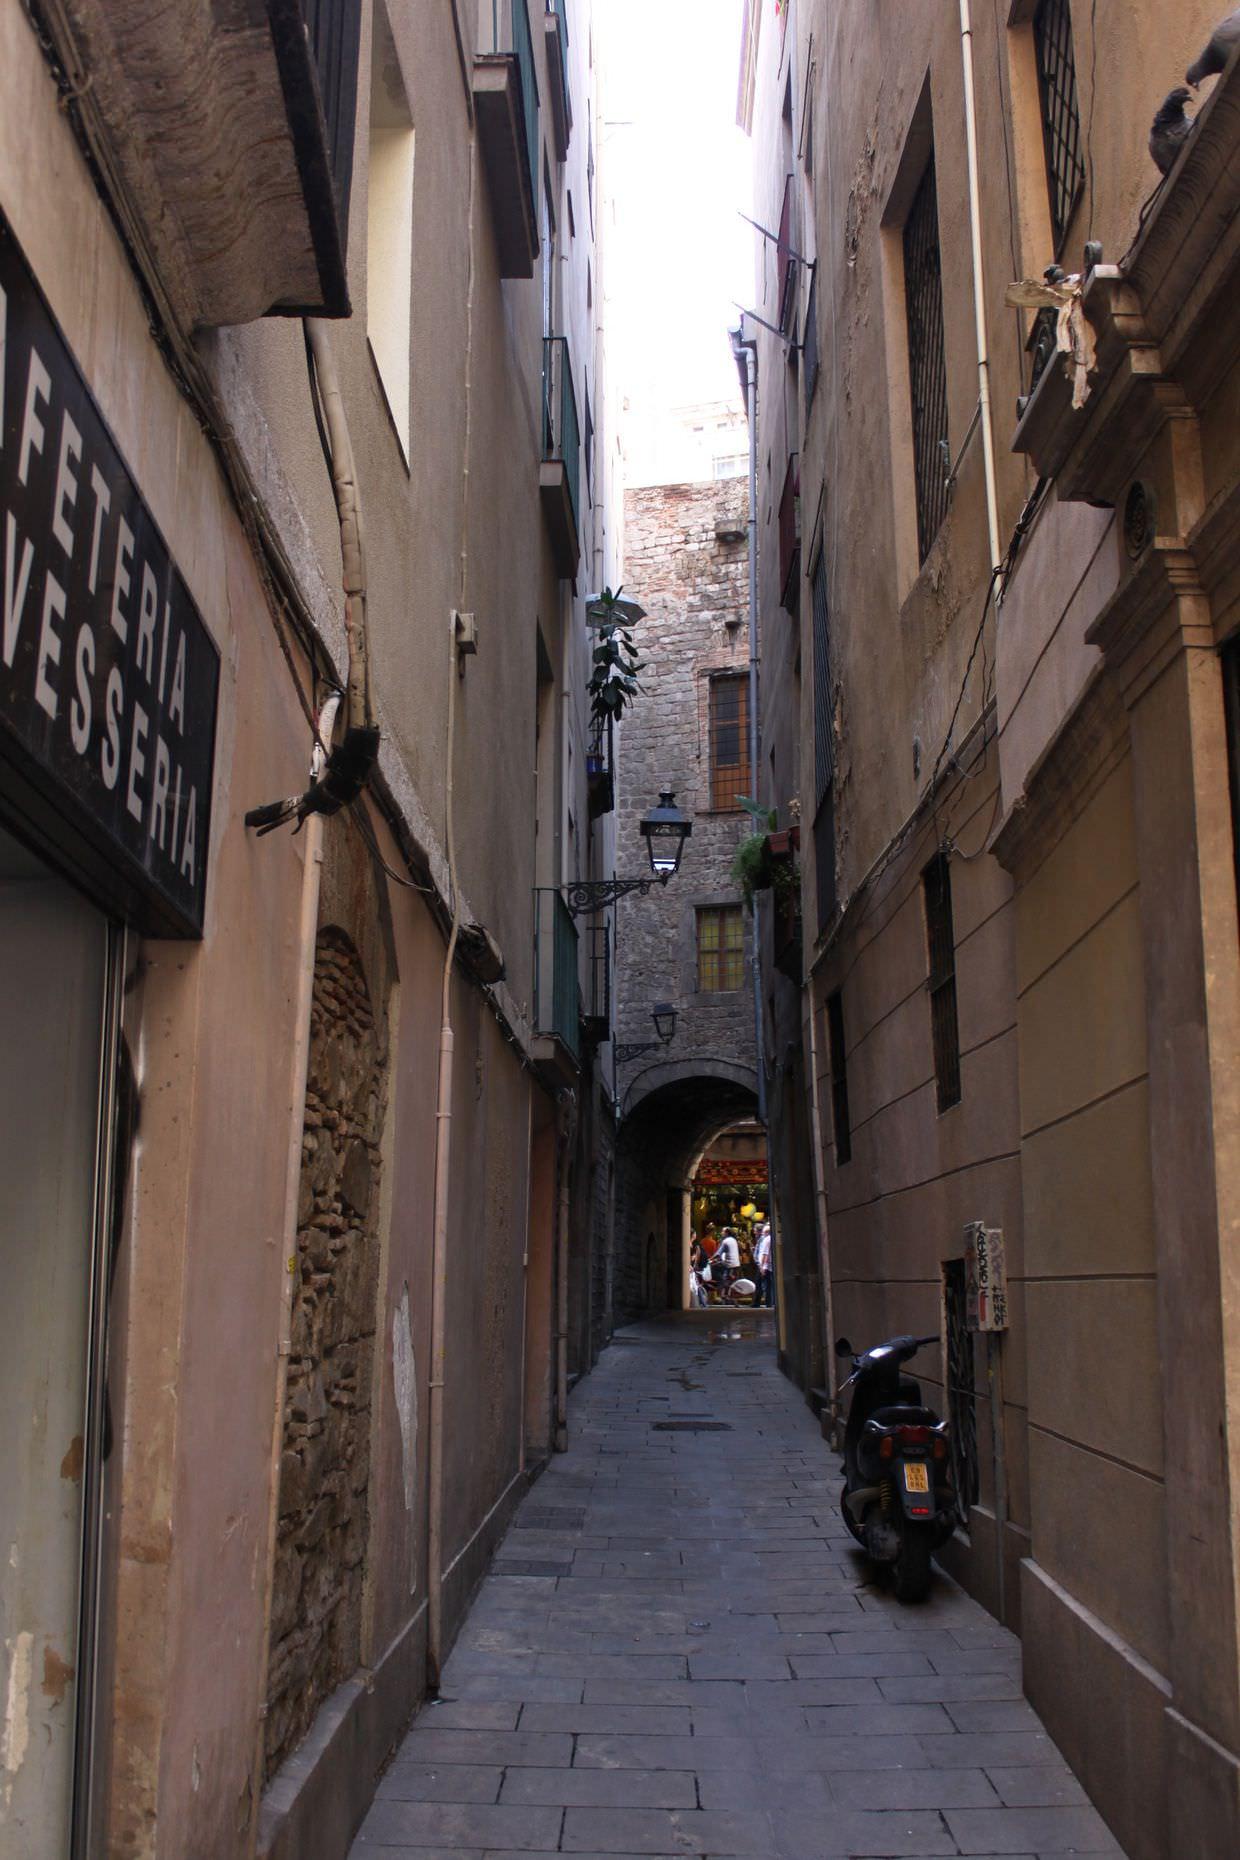 Narrow streets of the Barri Gòtic quarter